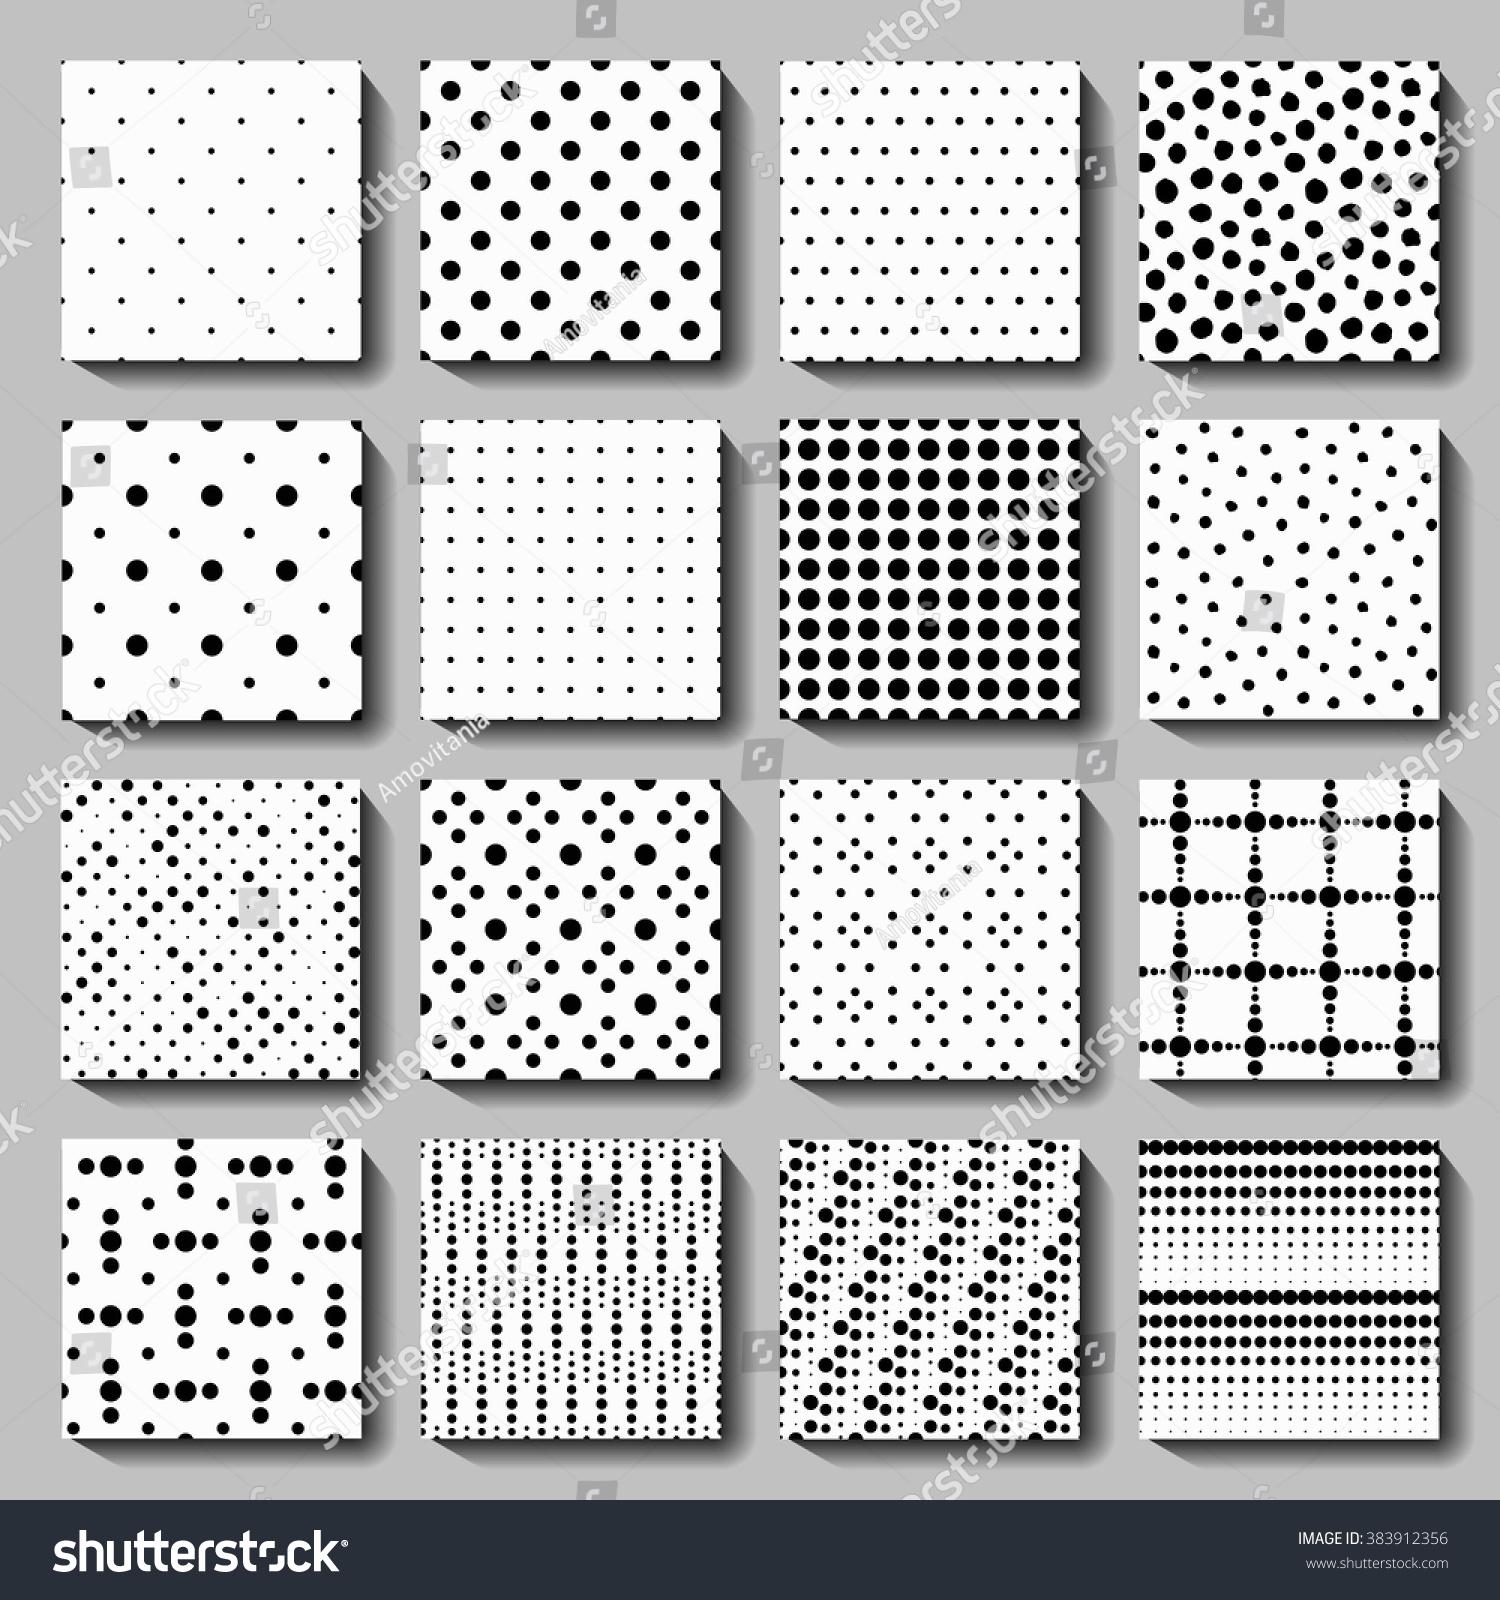 Vector Polka Dot Seamless Patterns Set Stock Vektorgrafik